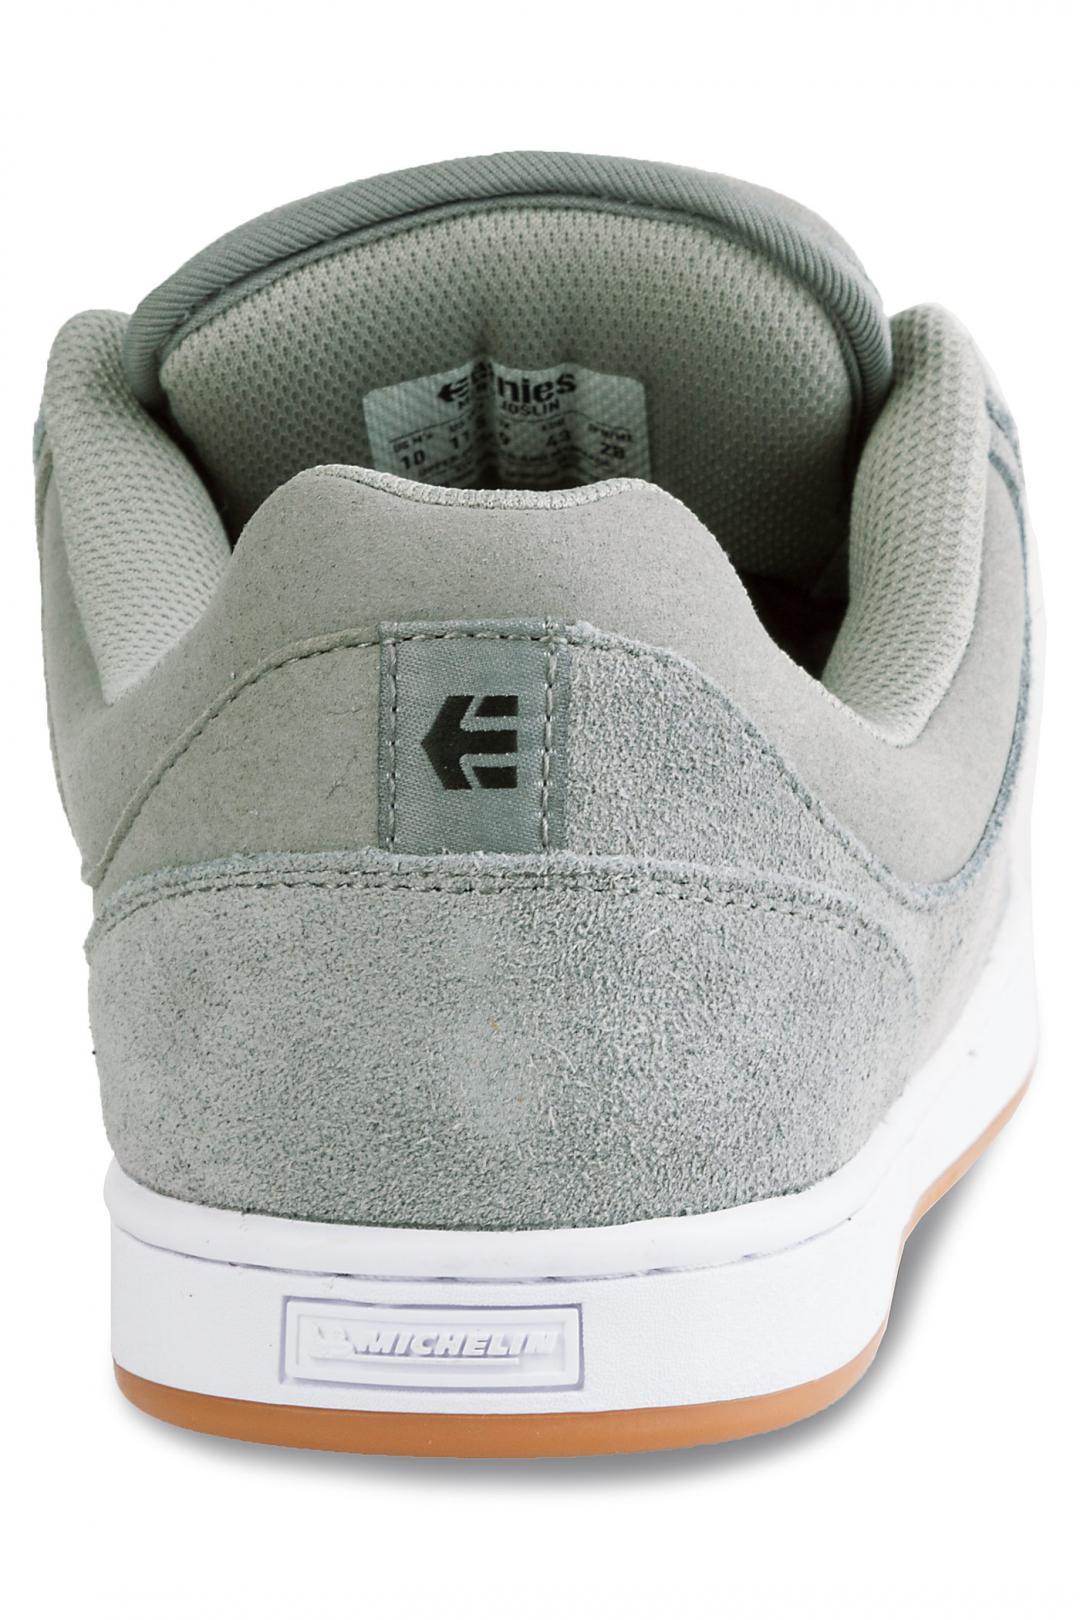 Uomo Etnies Joslin Pro grey white gum   Sneakers low top